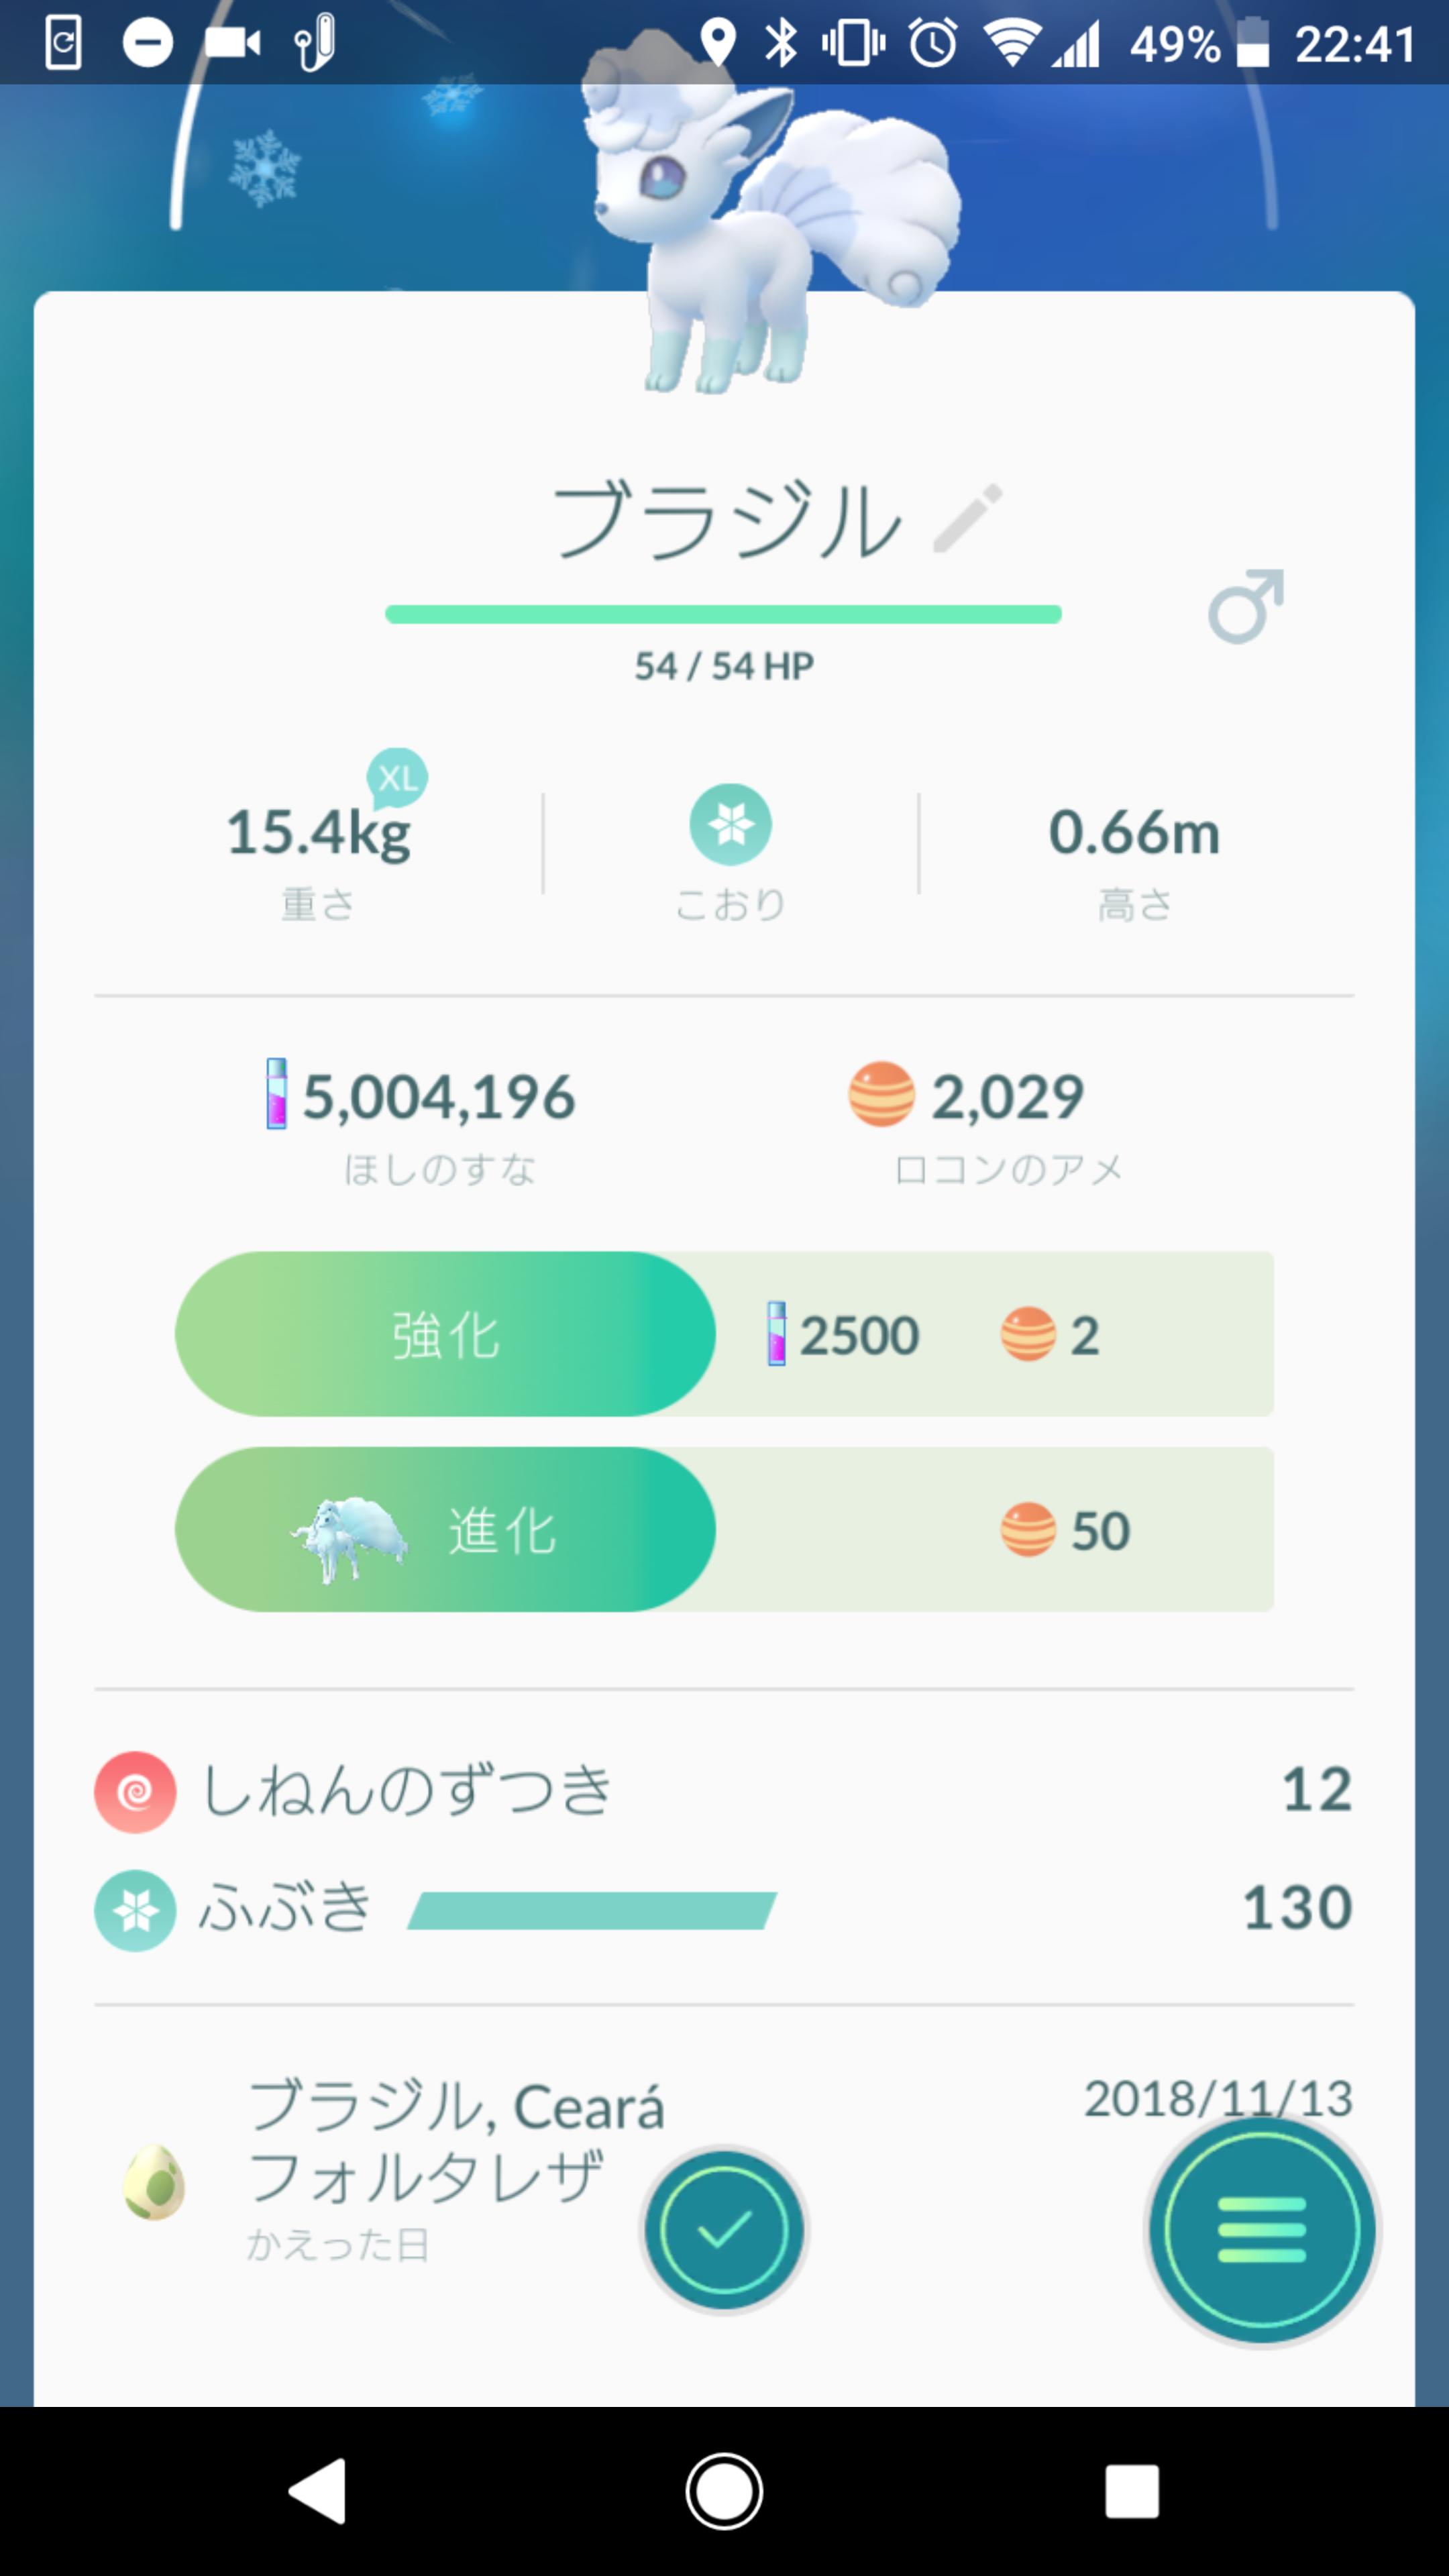 Screenshot_20181113-224131.png